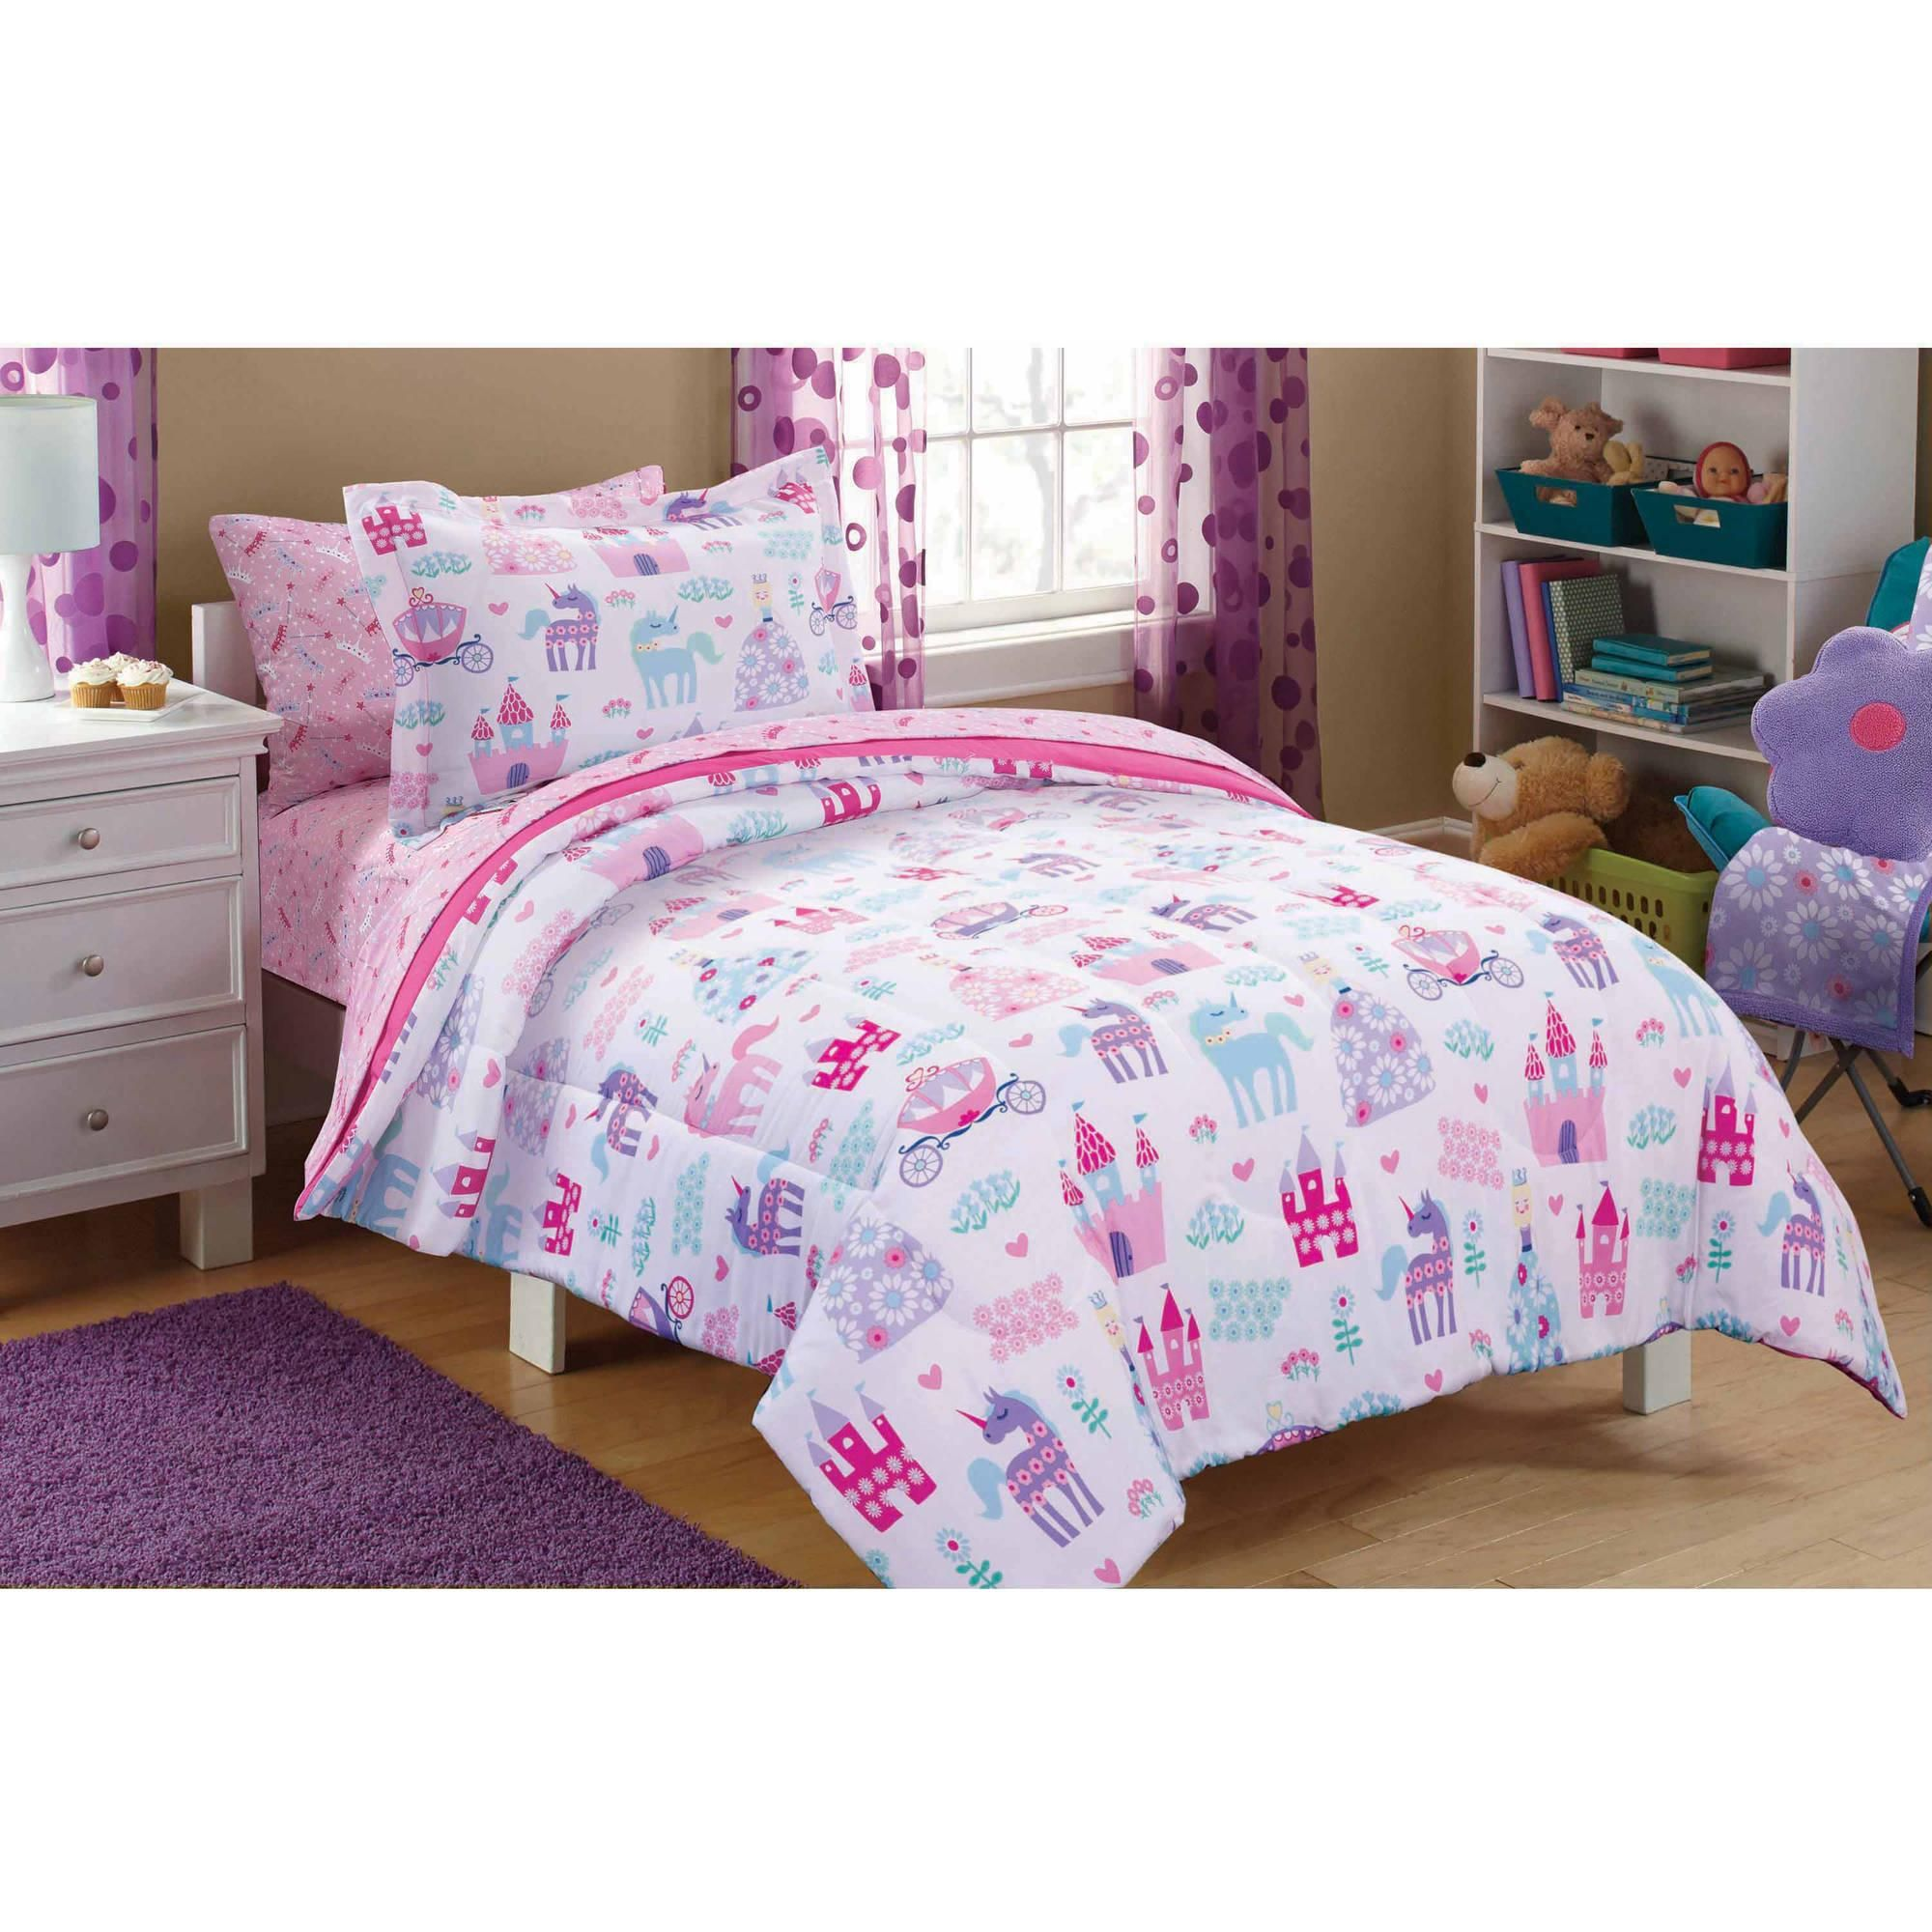 HttpwwwwalmartcomipMainstaysKidsPrettyPrincessBedina - Walmart girl bedroom furniture